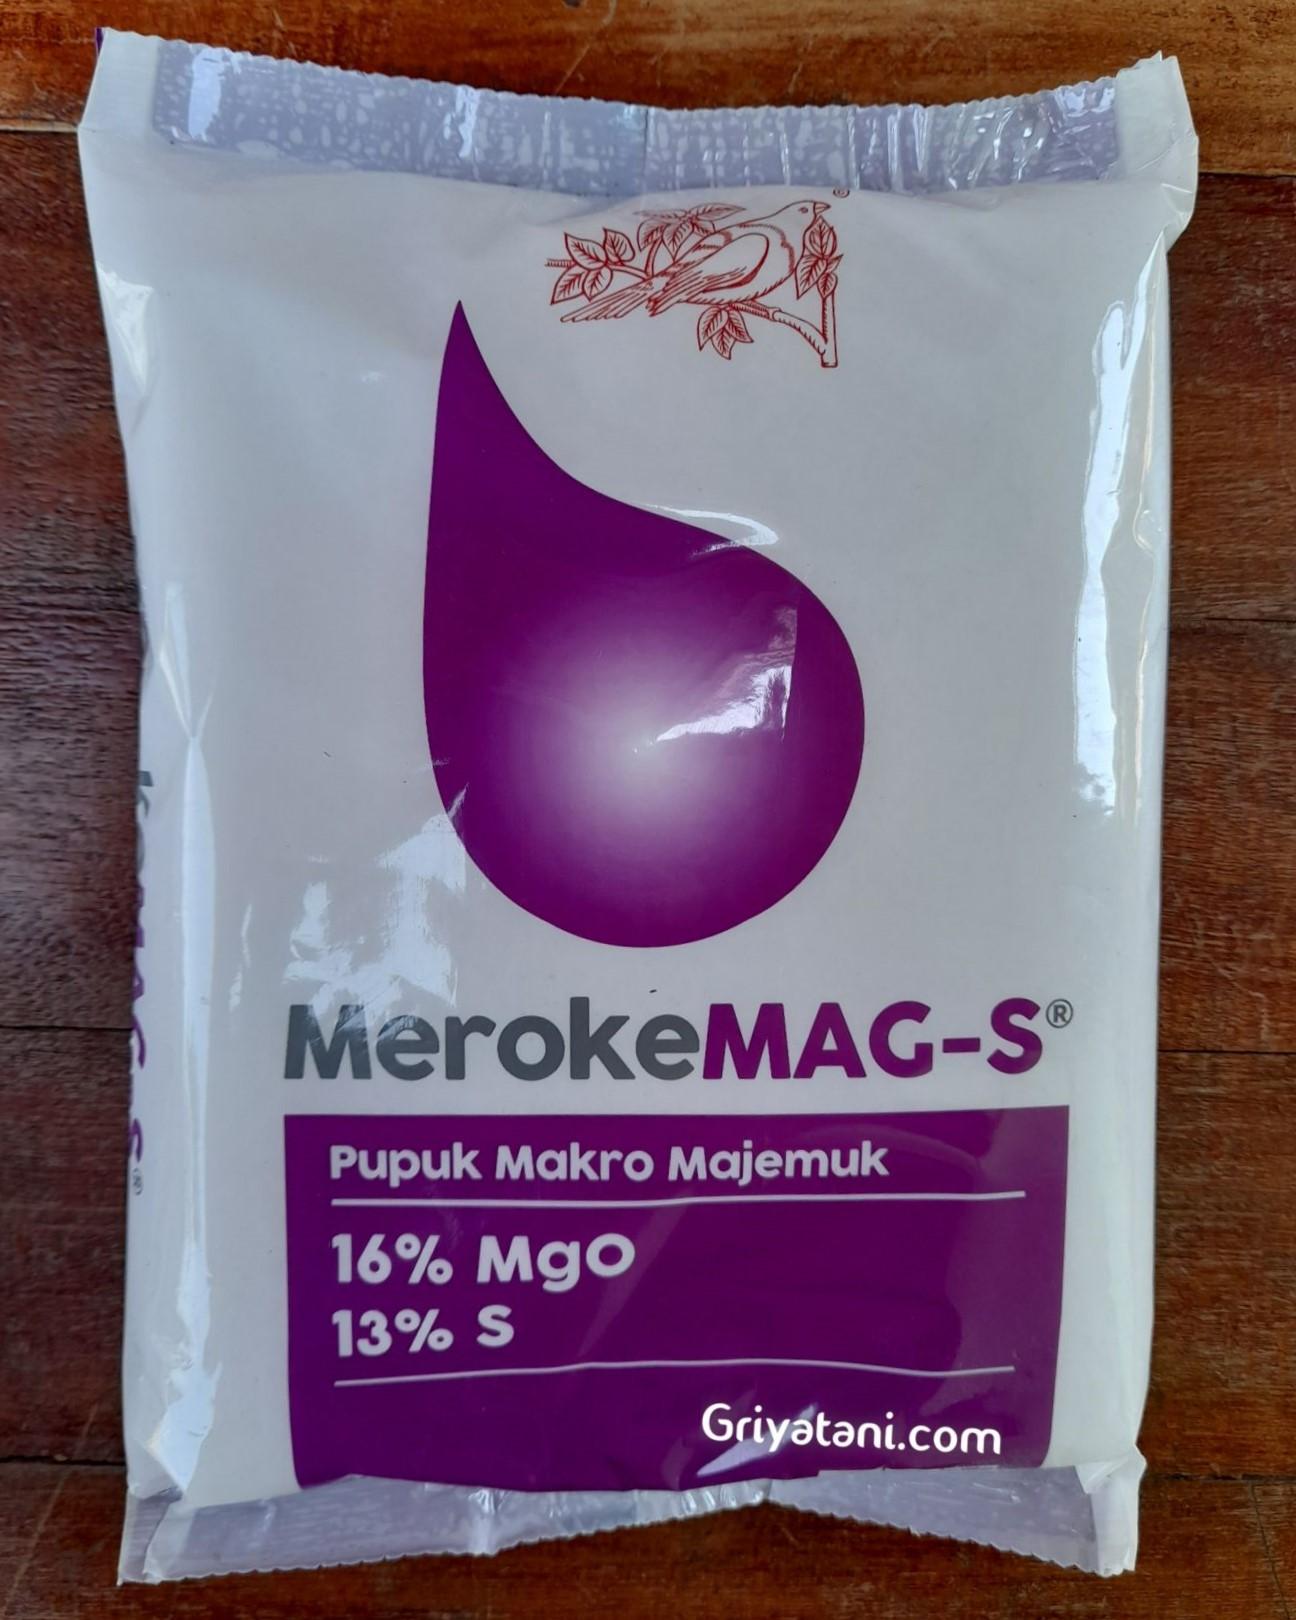 Meroke MAG S